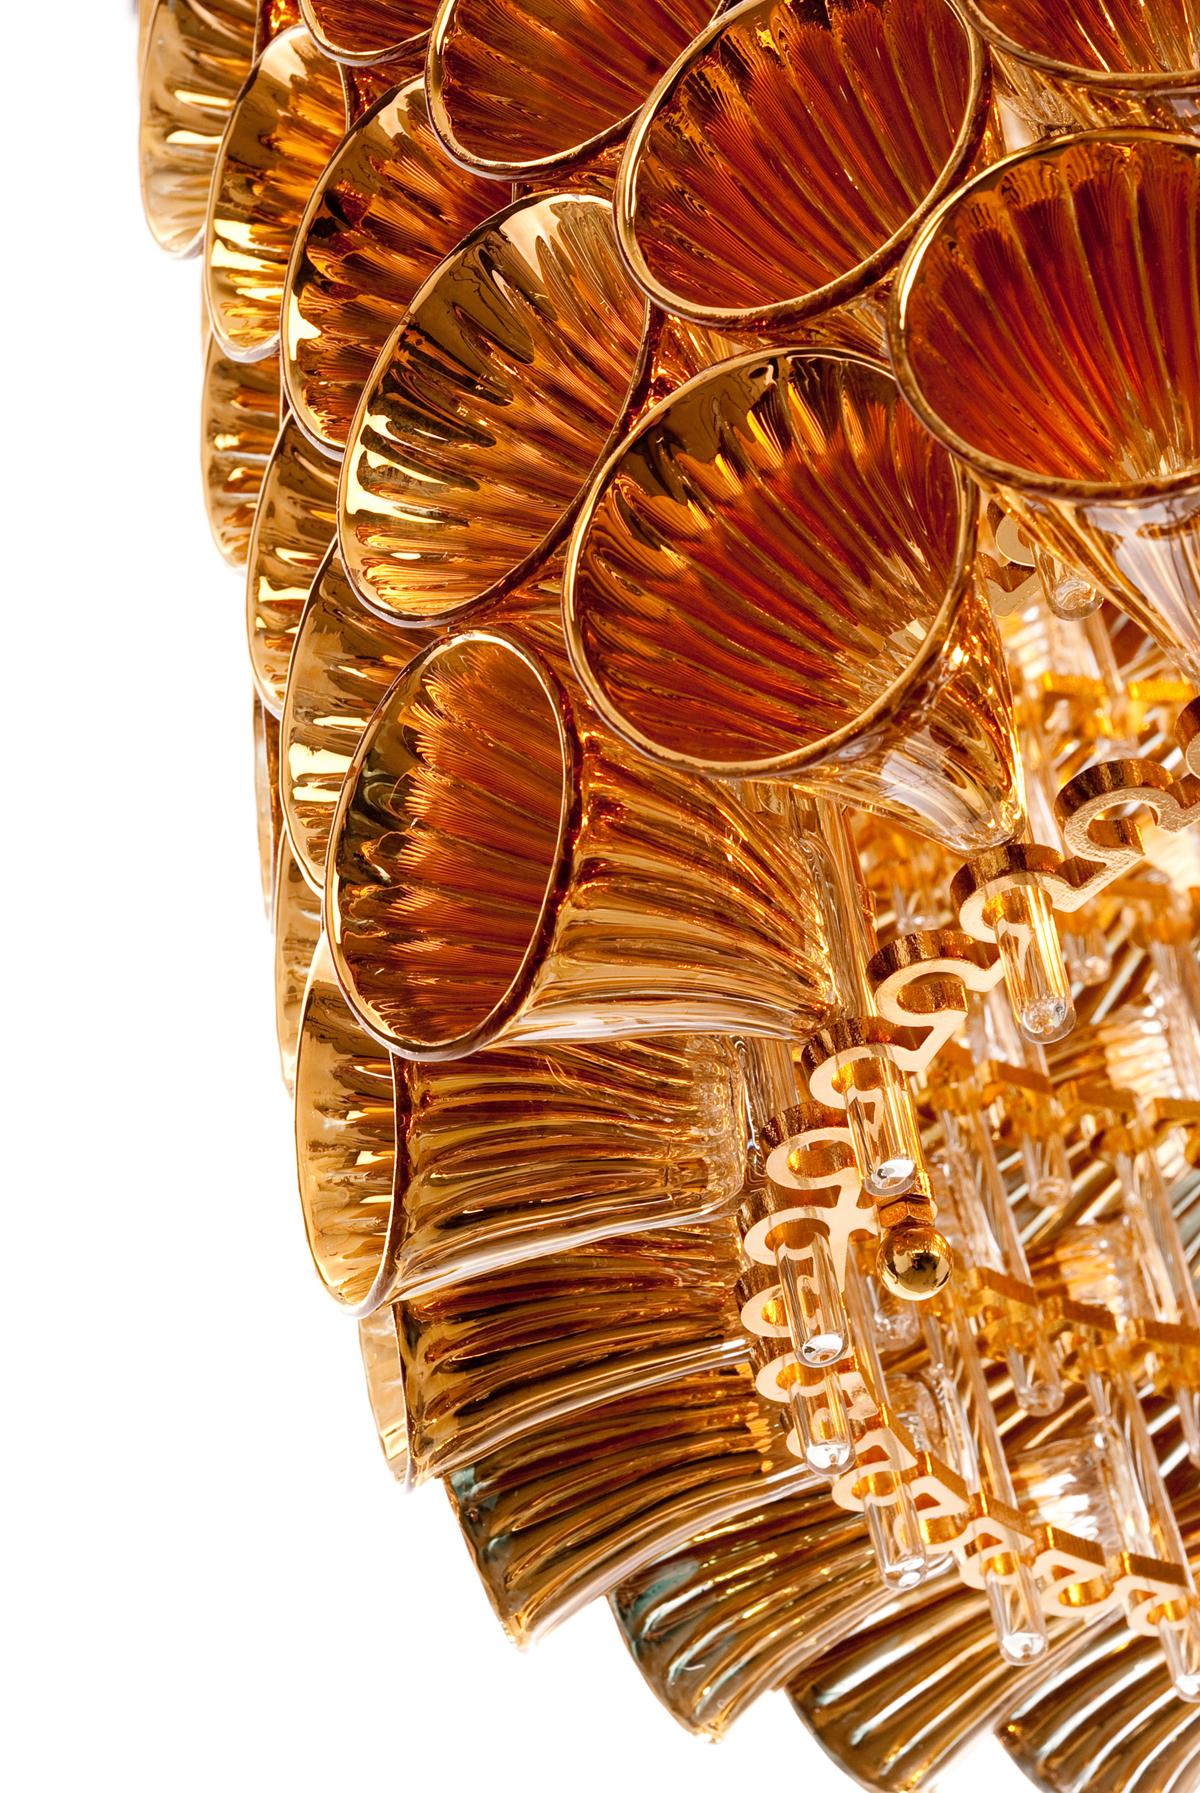 corail-suspension-gold-veronese-maurizio-galante-tal-lancman-3.jpg